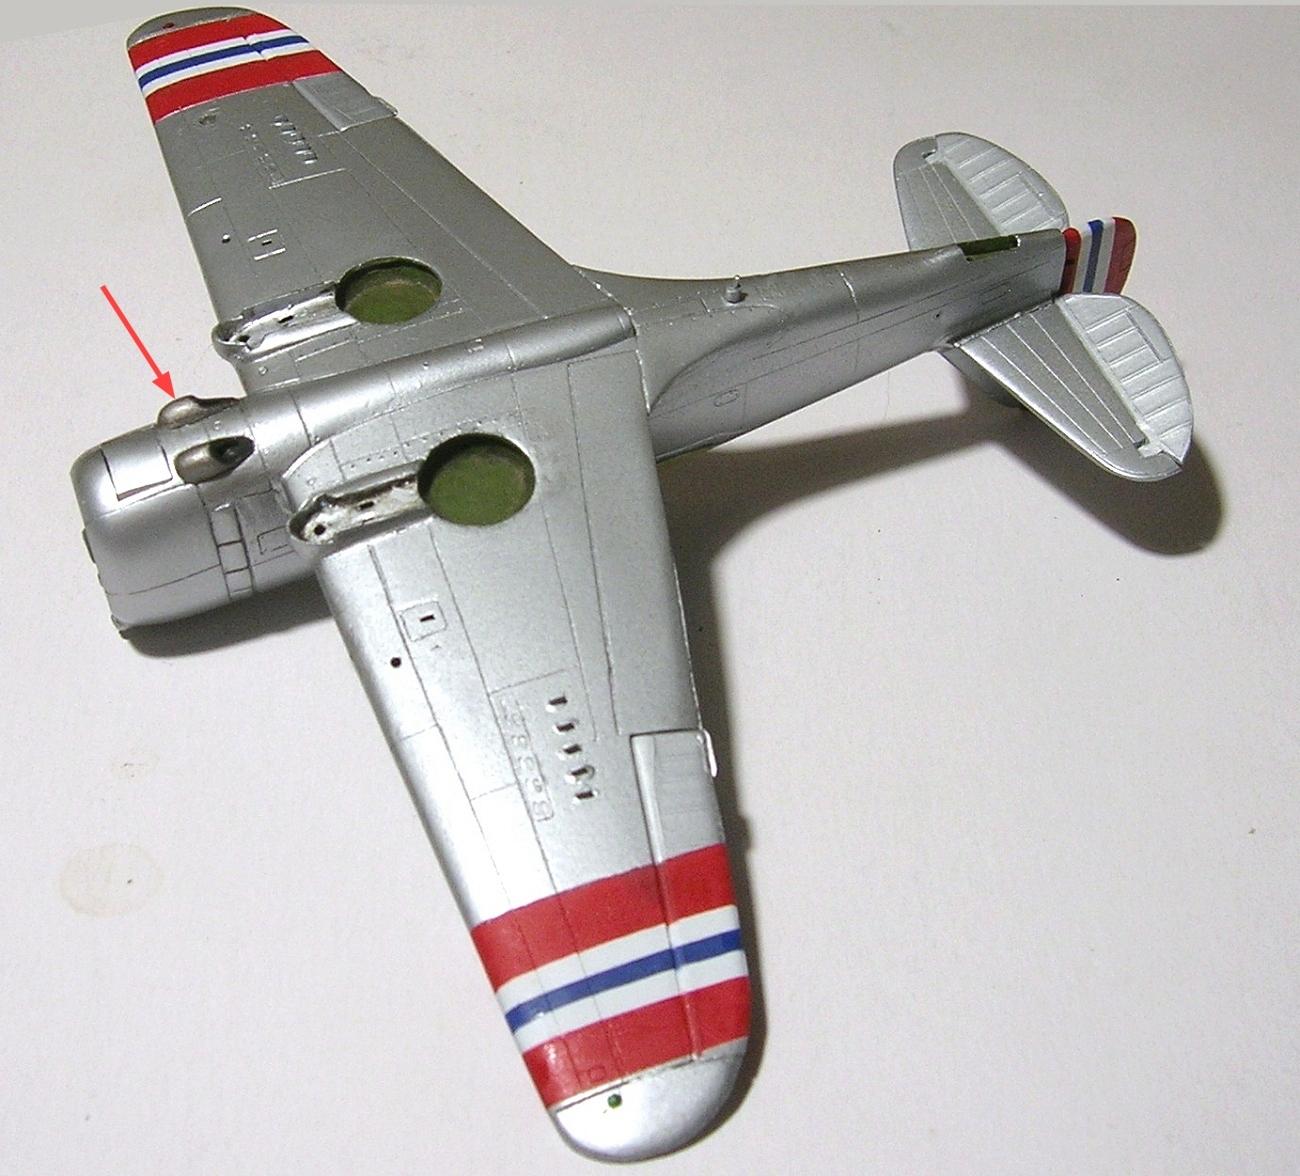 Montage_Curtiss H75A6 Hawk norvégien 1/72 - Page 4 Monta140